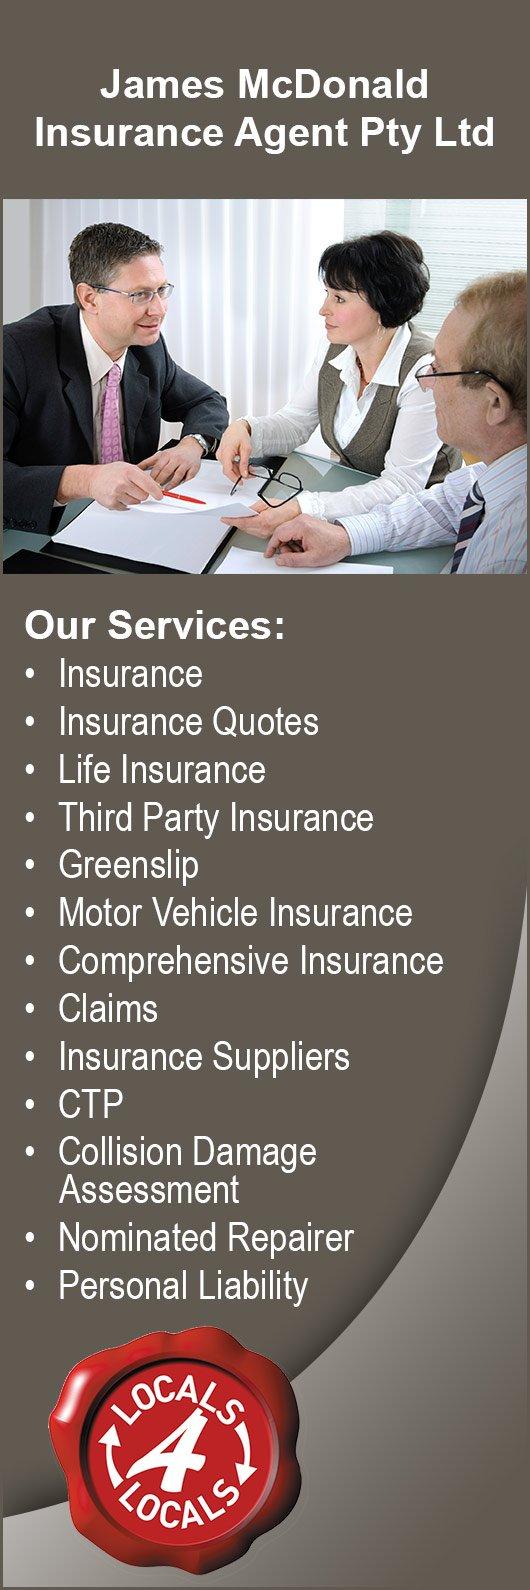 James McDonald Insurance Agent Pty Ltd - Car Insurance Providers ...